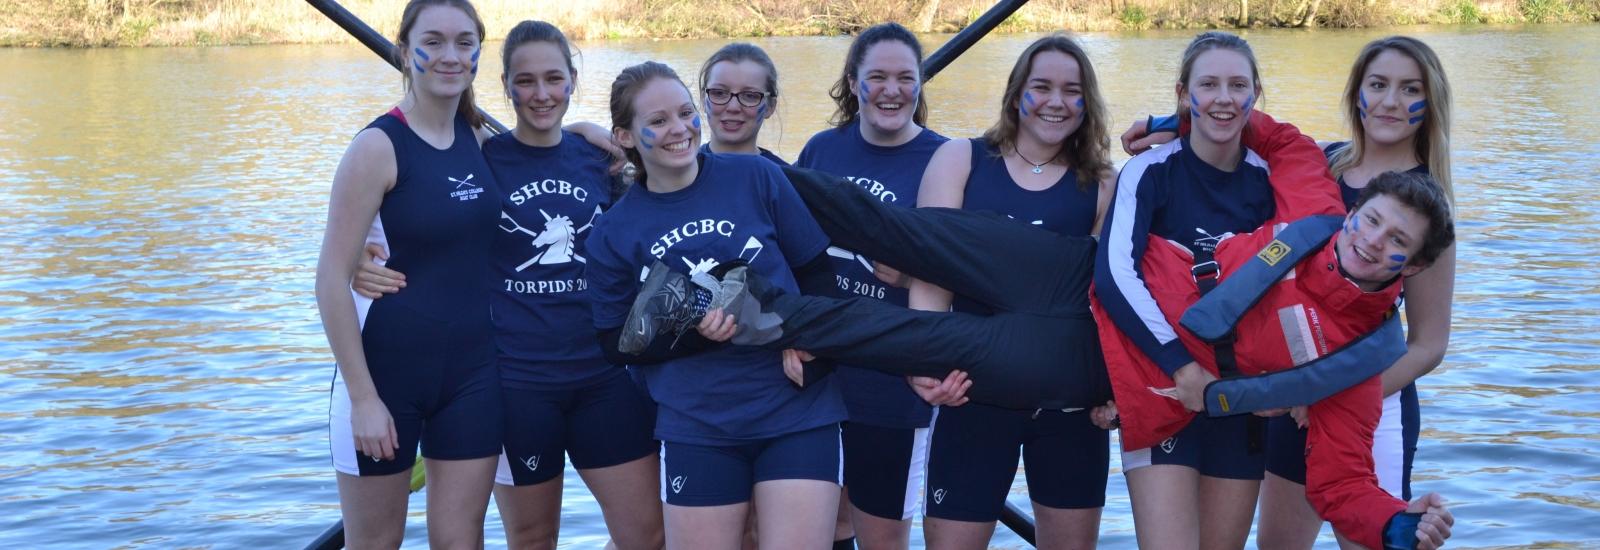 St Hilda's rowers